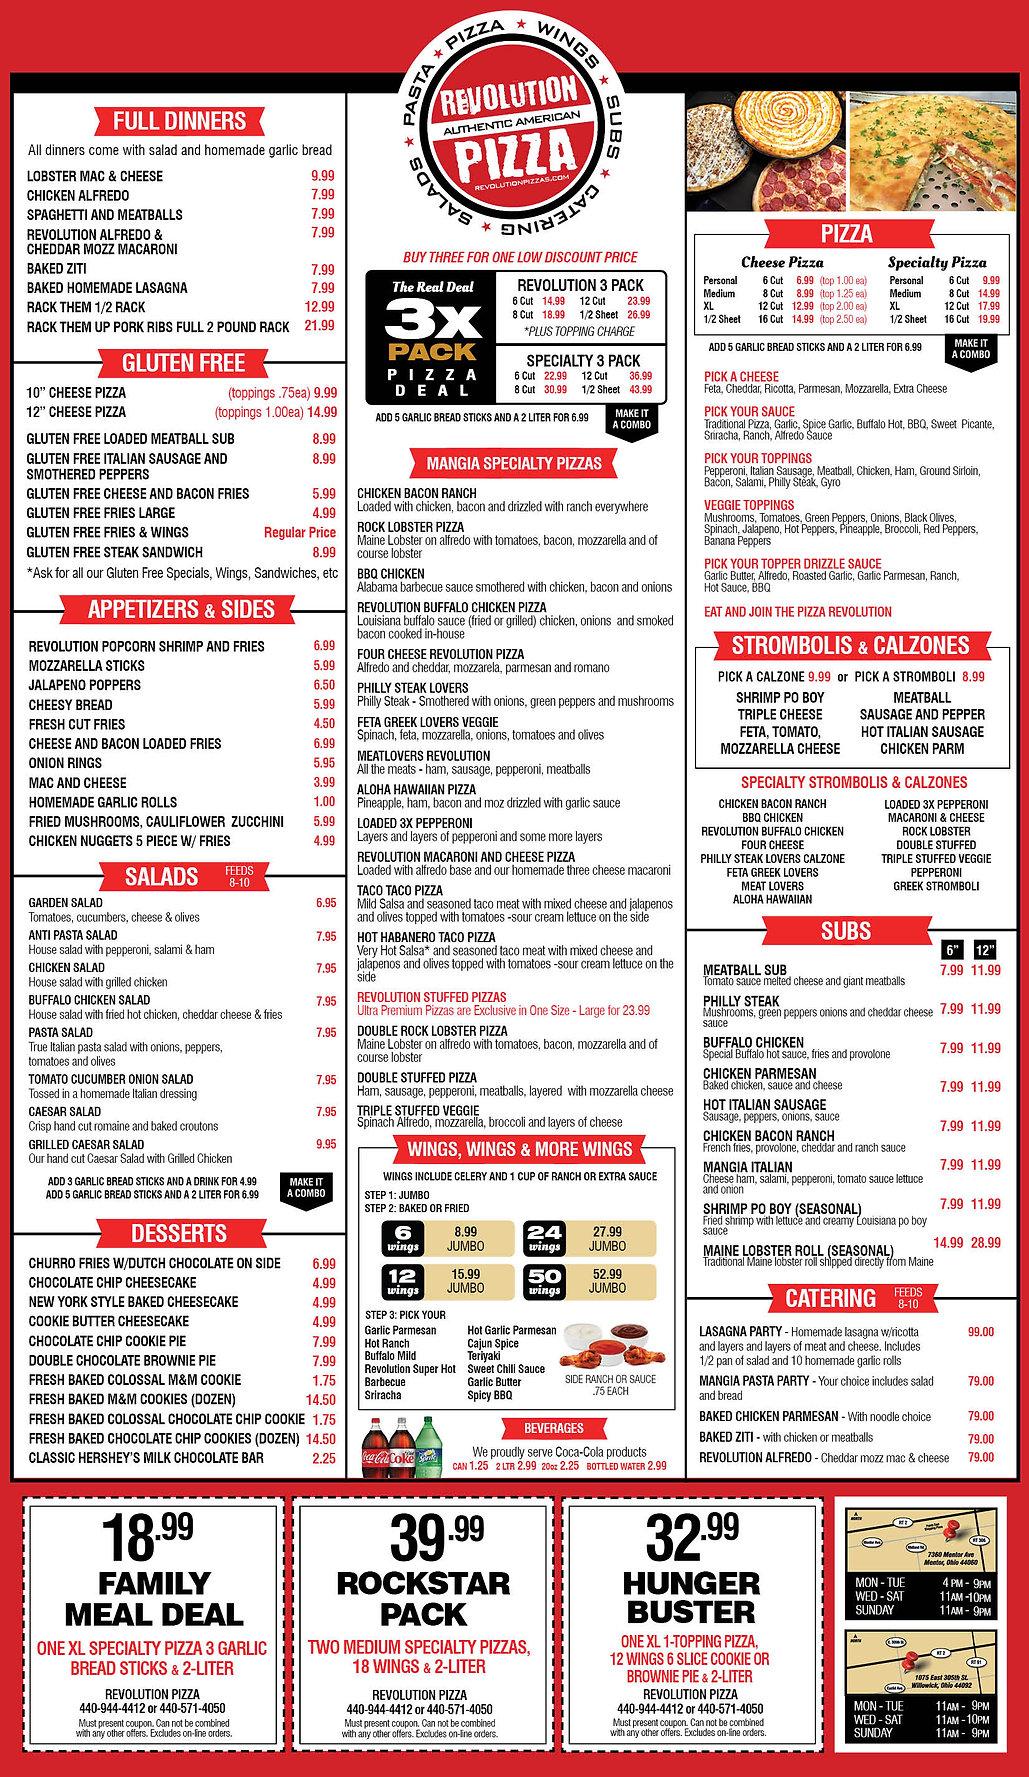 Mentor Ohio Pizza- Pizza near me mentor ohio Revolution menu